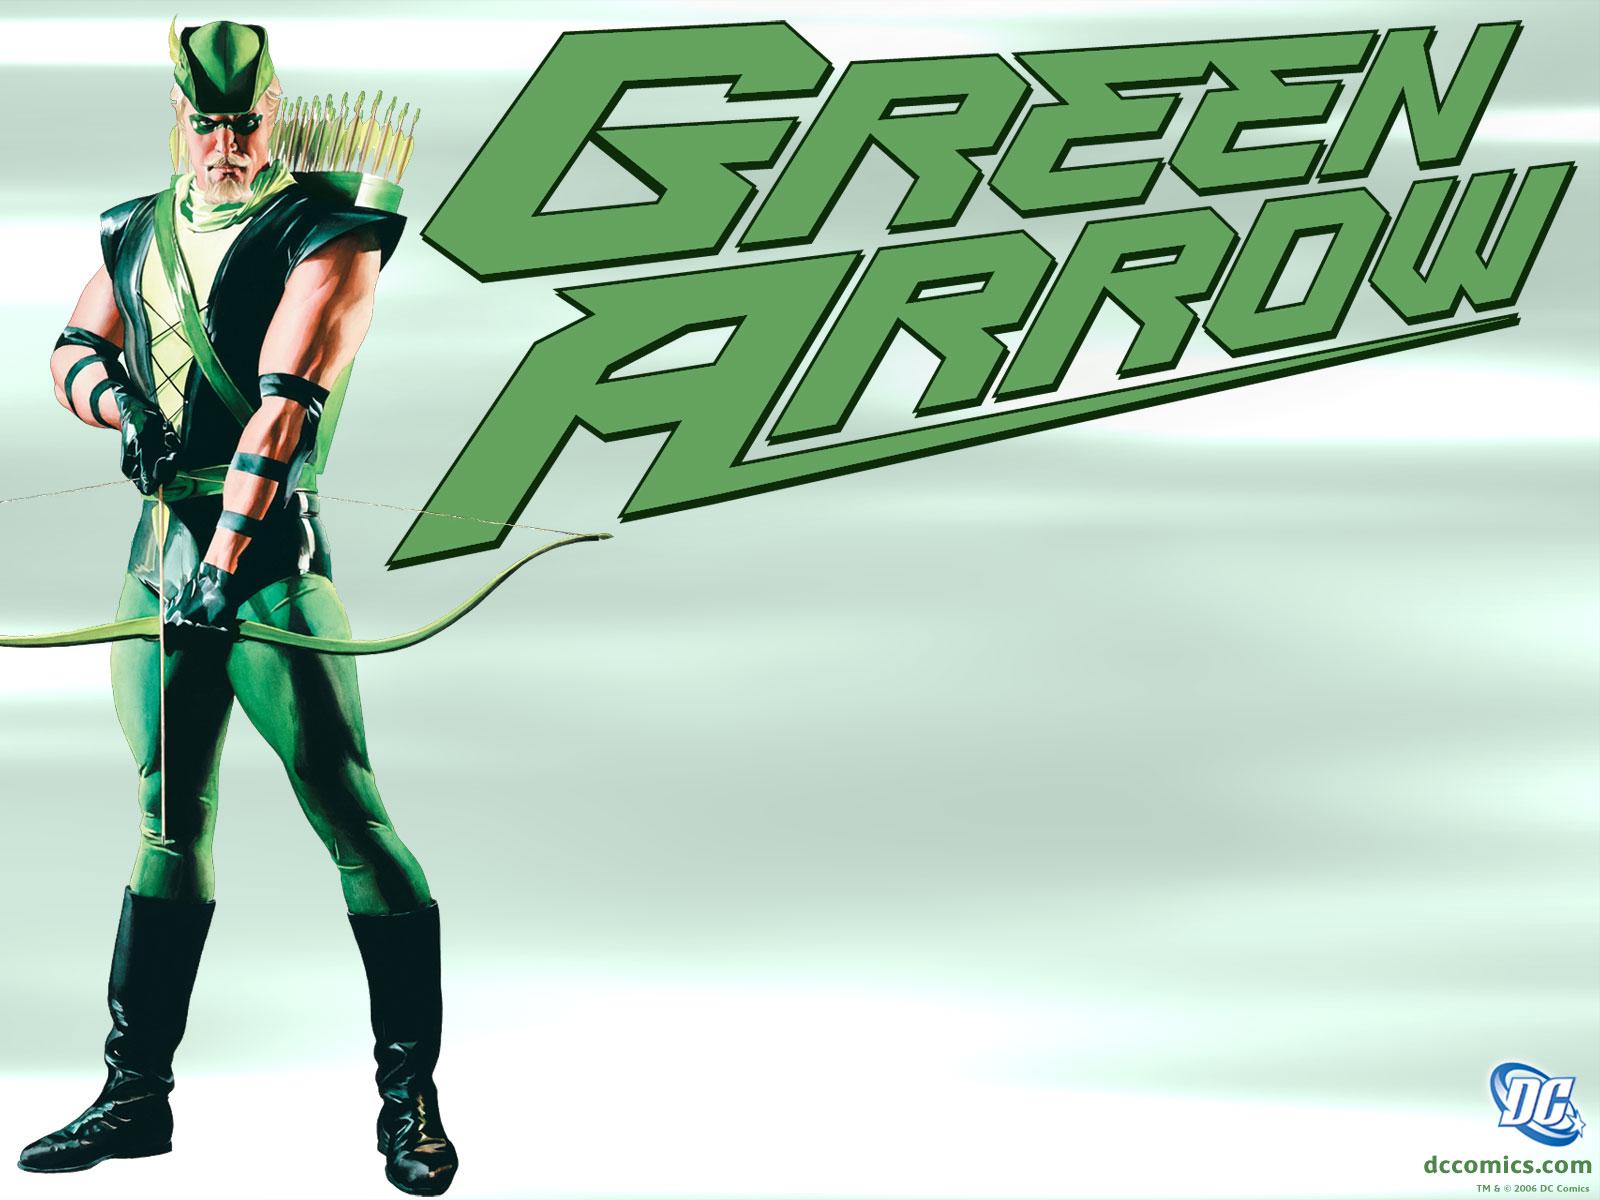 green arrow green arrow wallpaper wallpaper - green arrow green